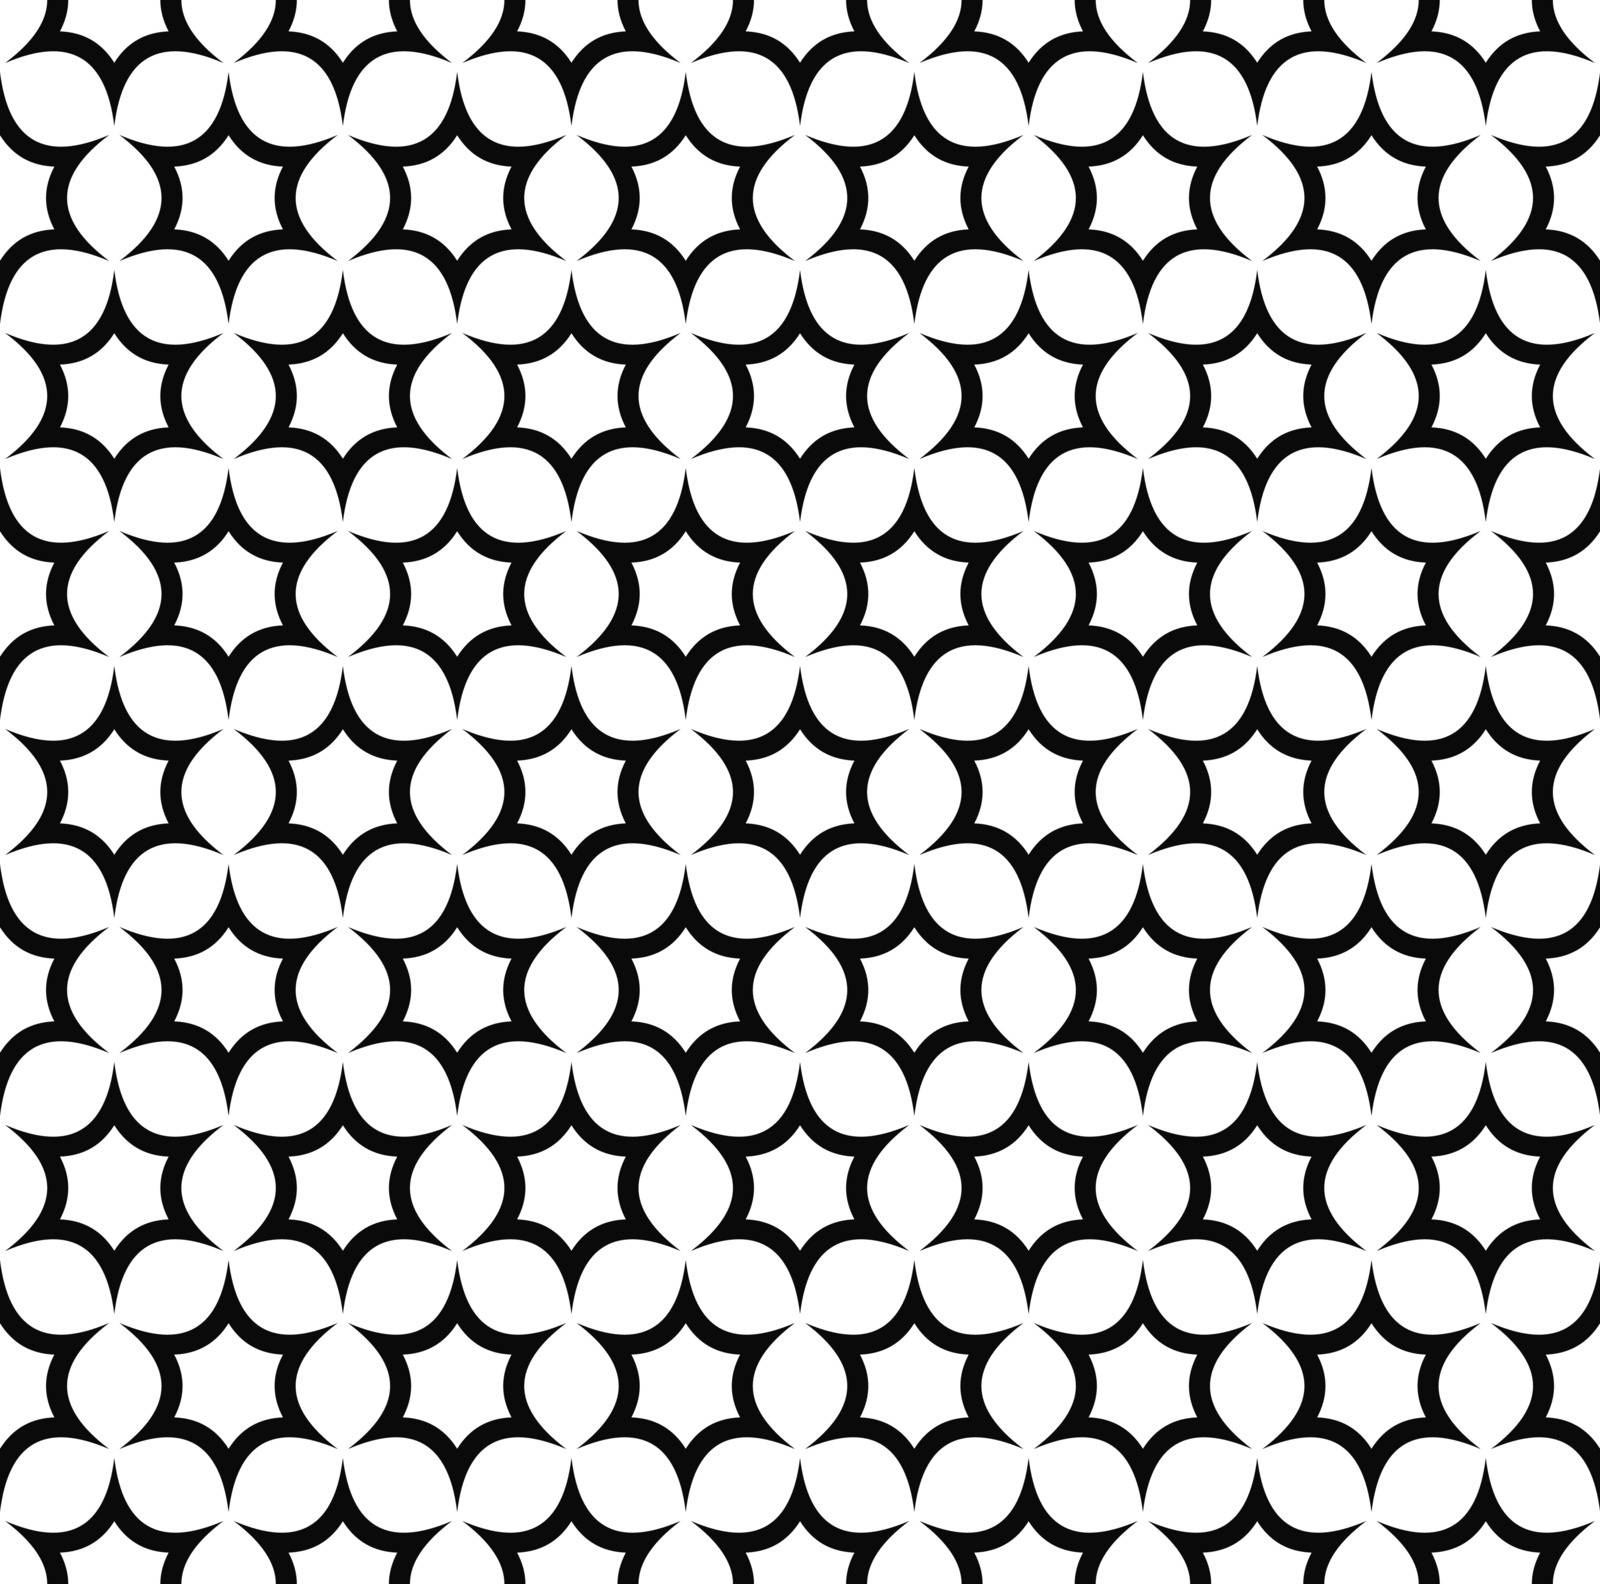 Seamless black and white hexagonal vector star pattern design